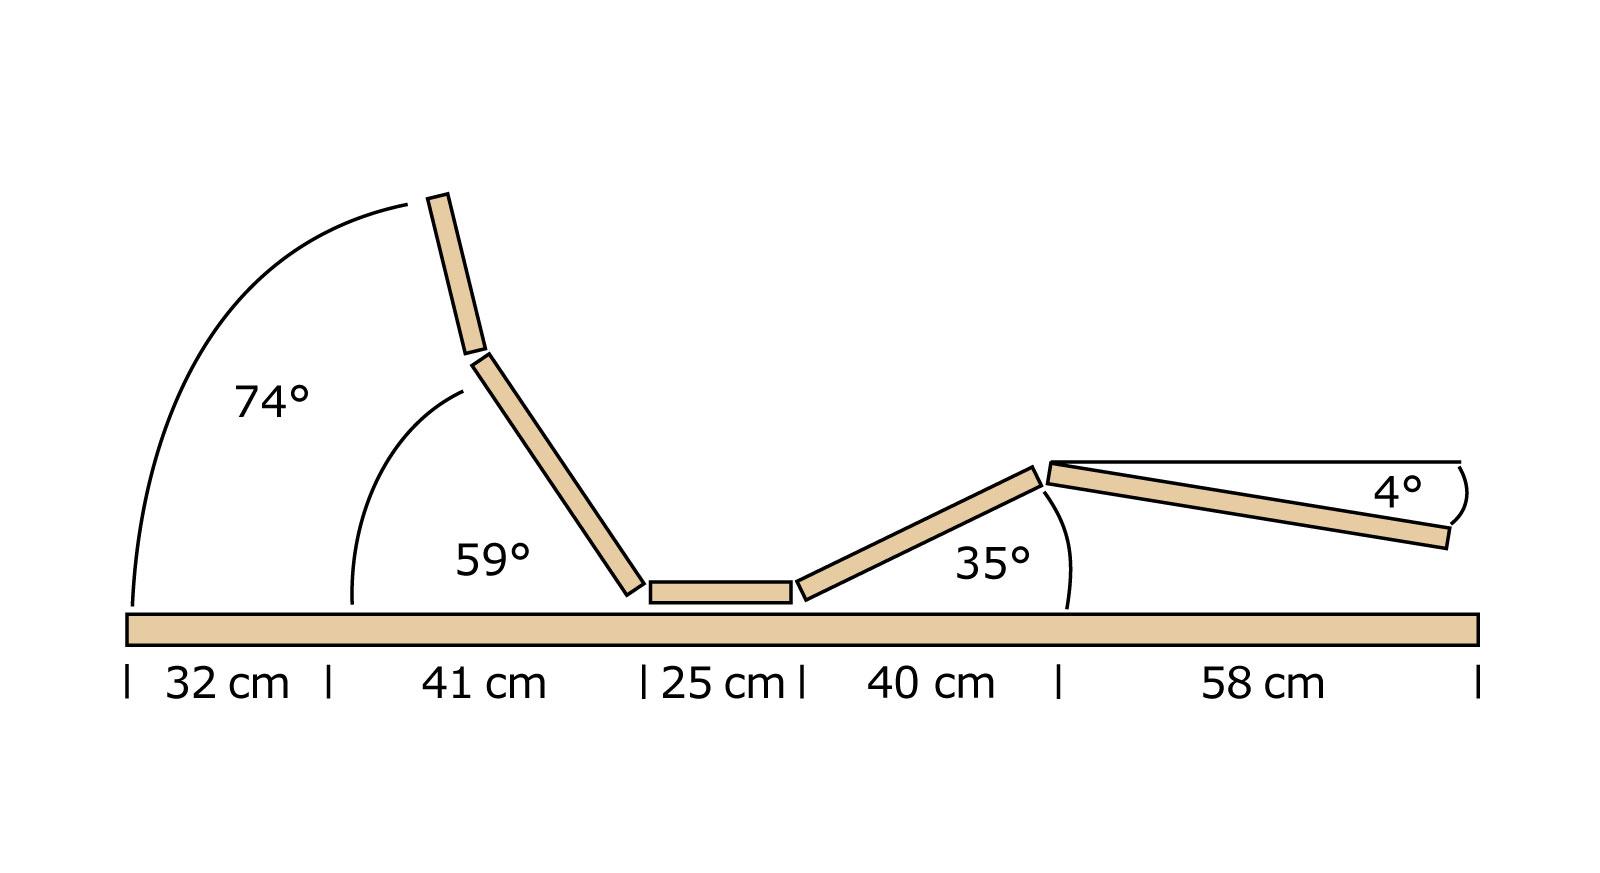 Vemassung des Lattenrosts orthowell ultraflex XXXL